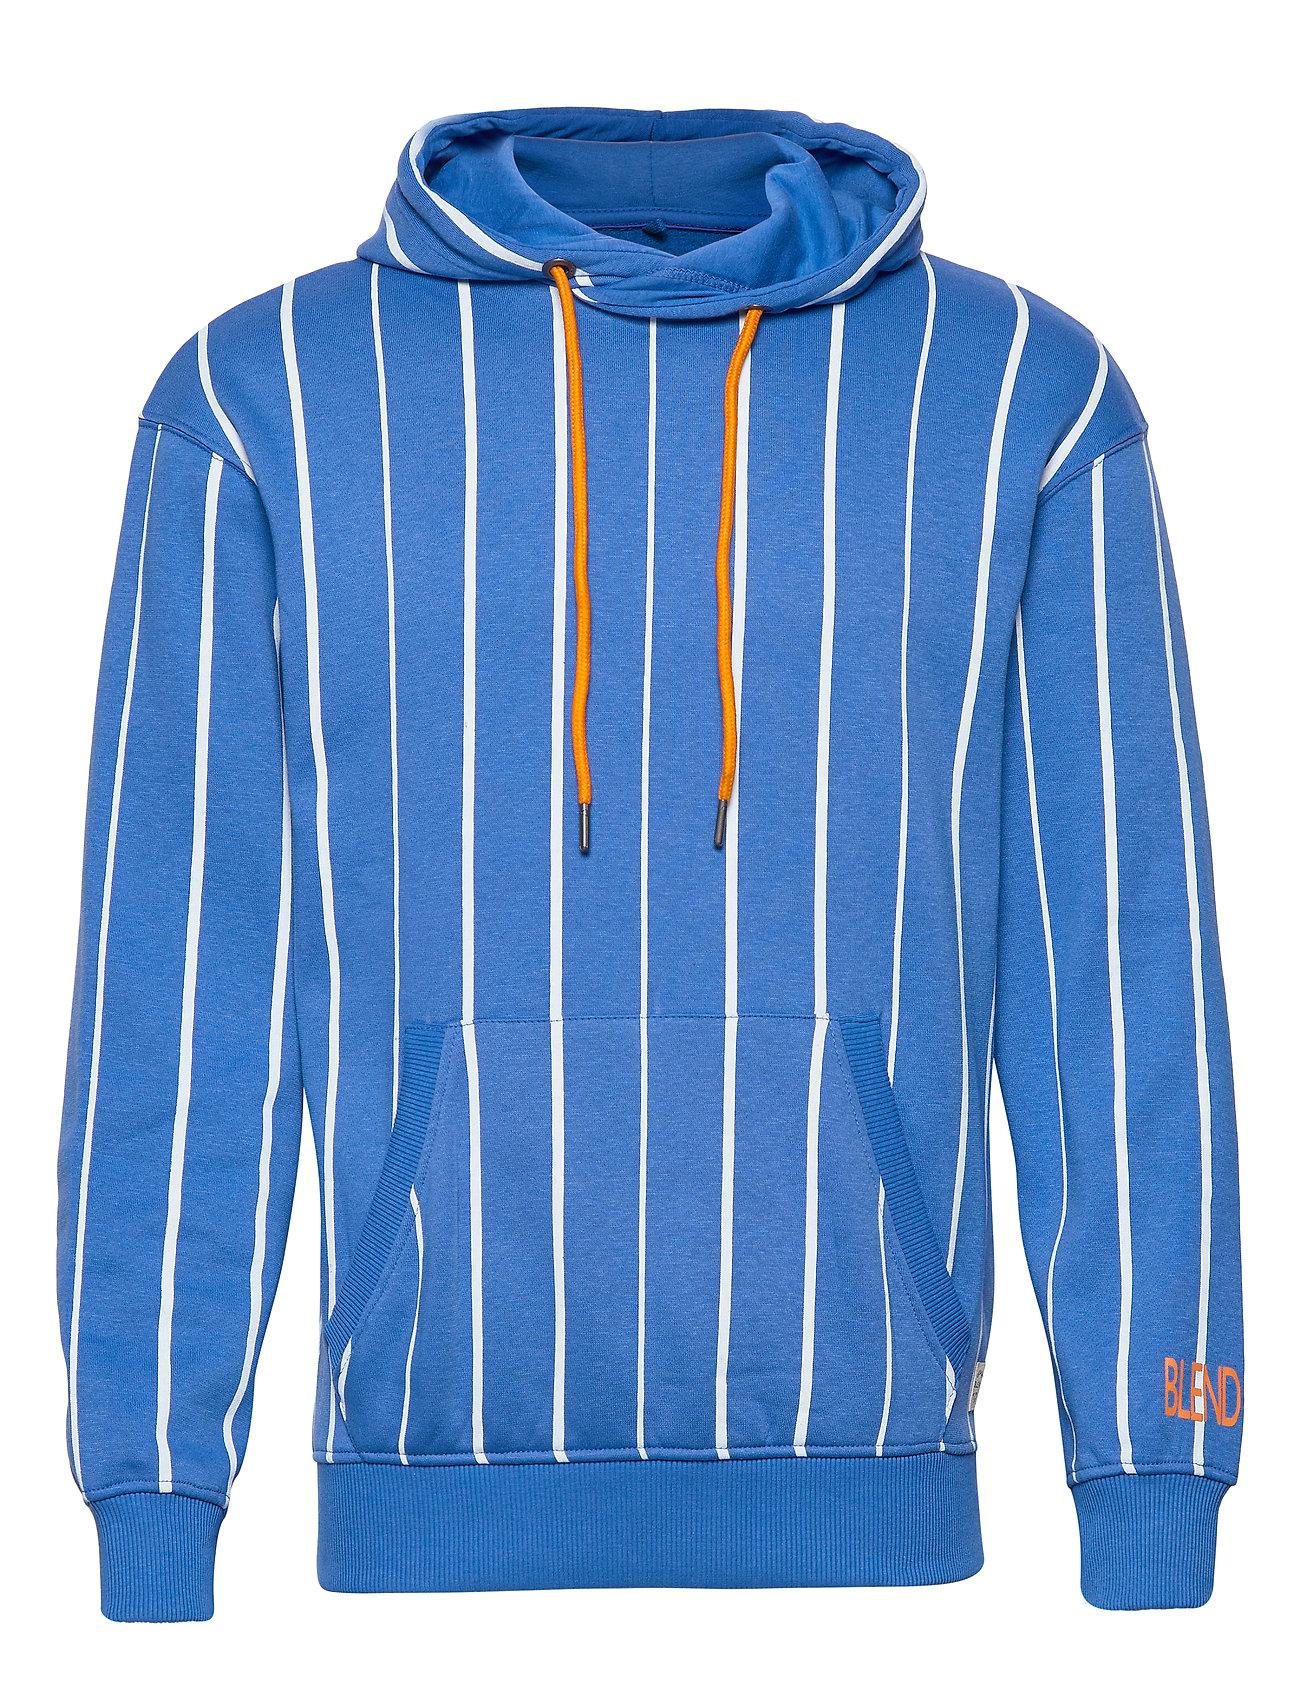 Blend Sweatshirt - ELECTRIC BLUE